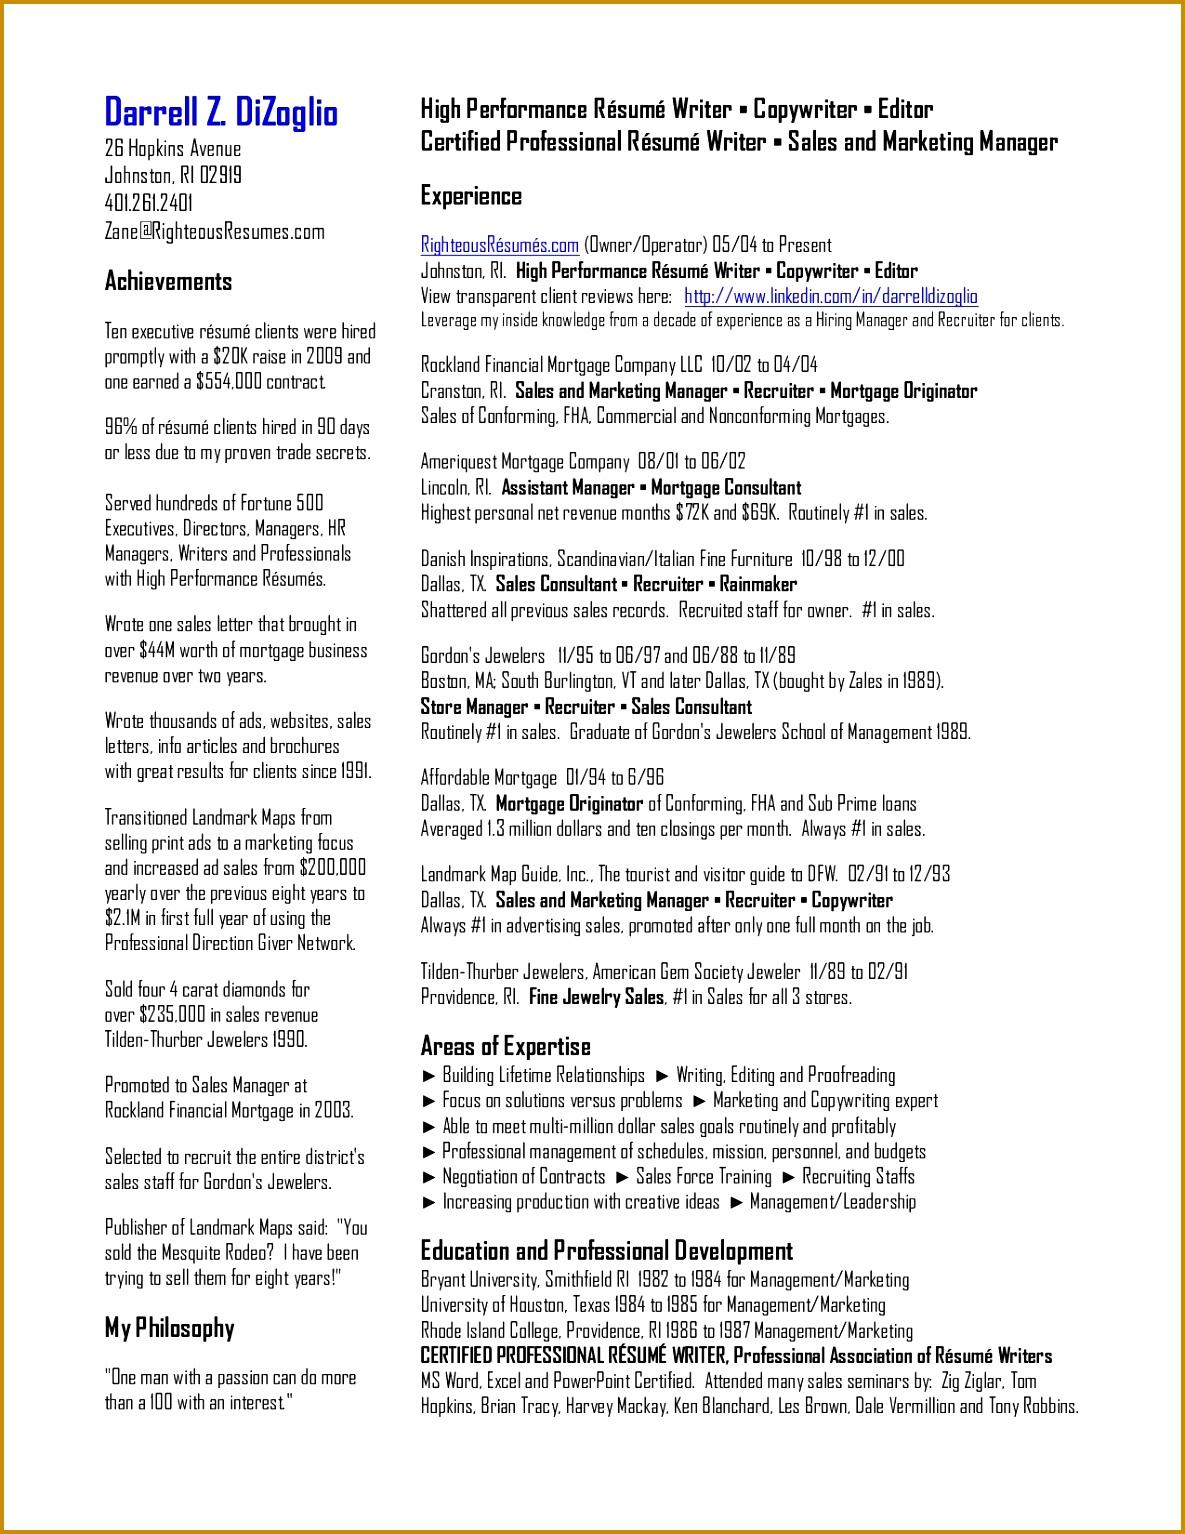 American Format Resume Inspirational Luxury Format Resume Unique Resume Cover Letter Formatted Resume 0d 15341185